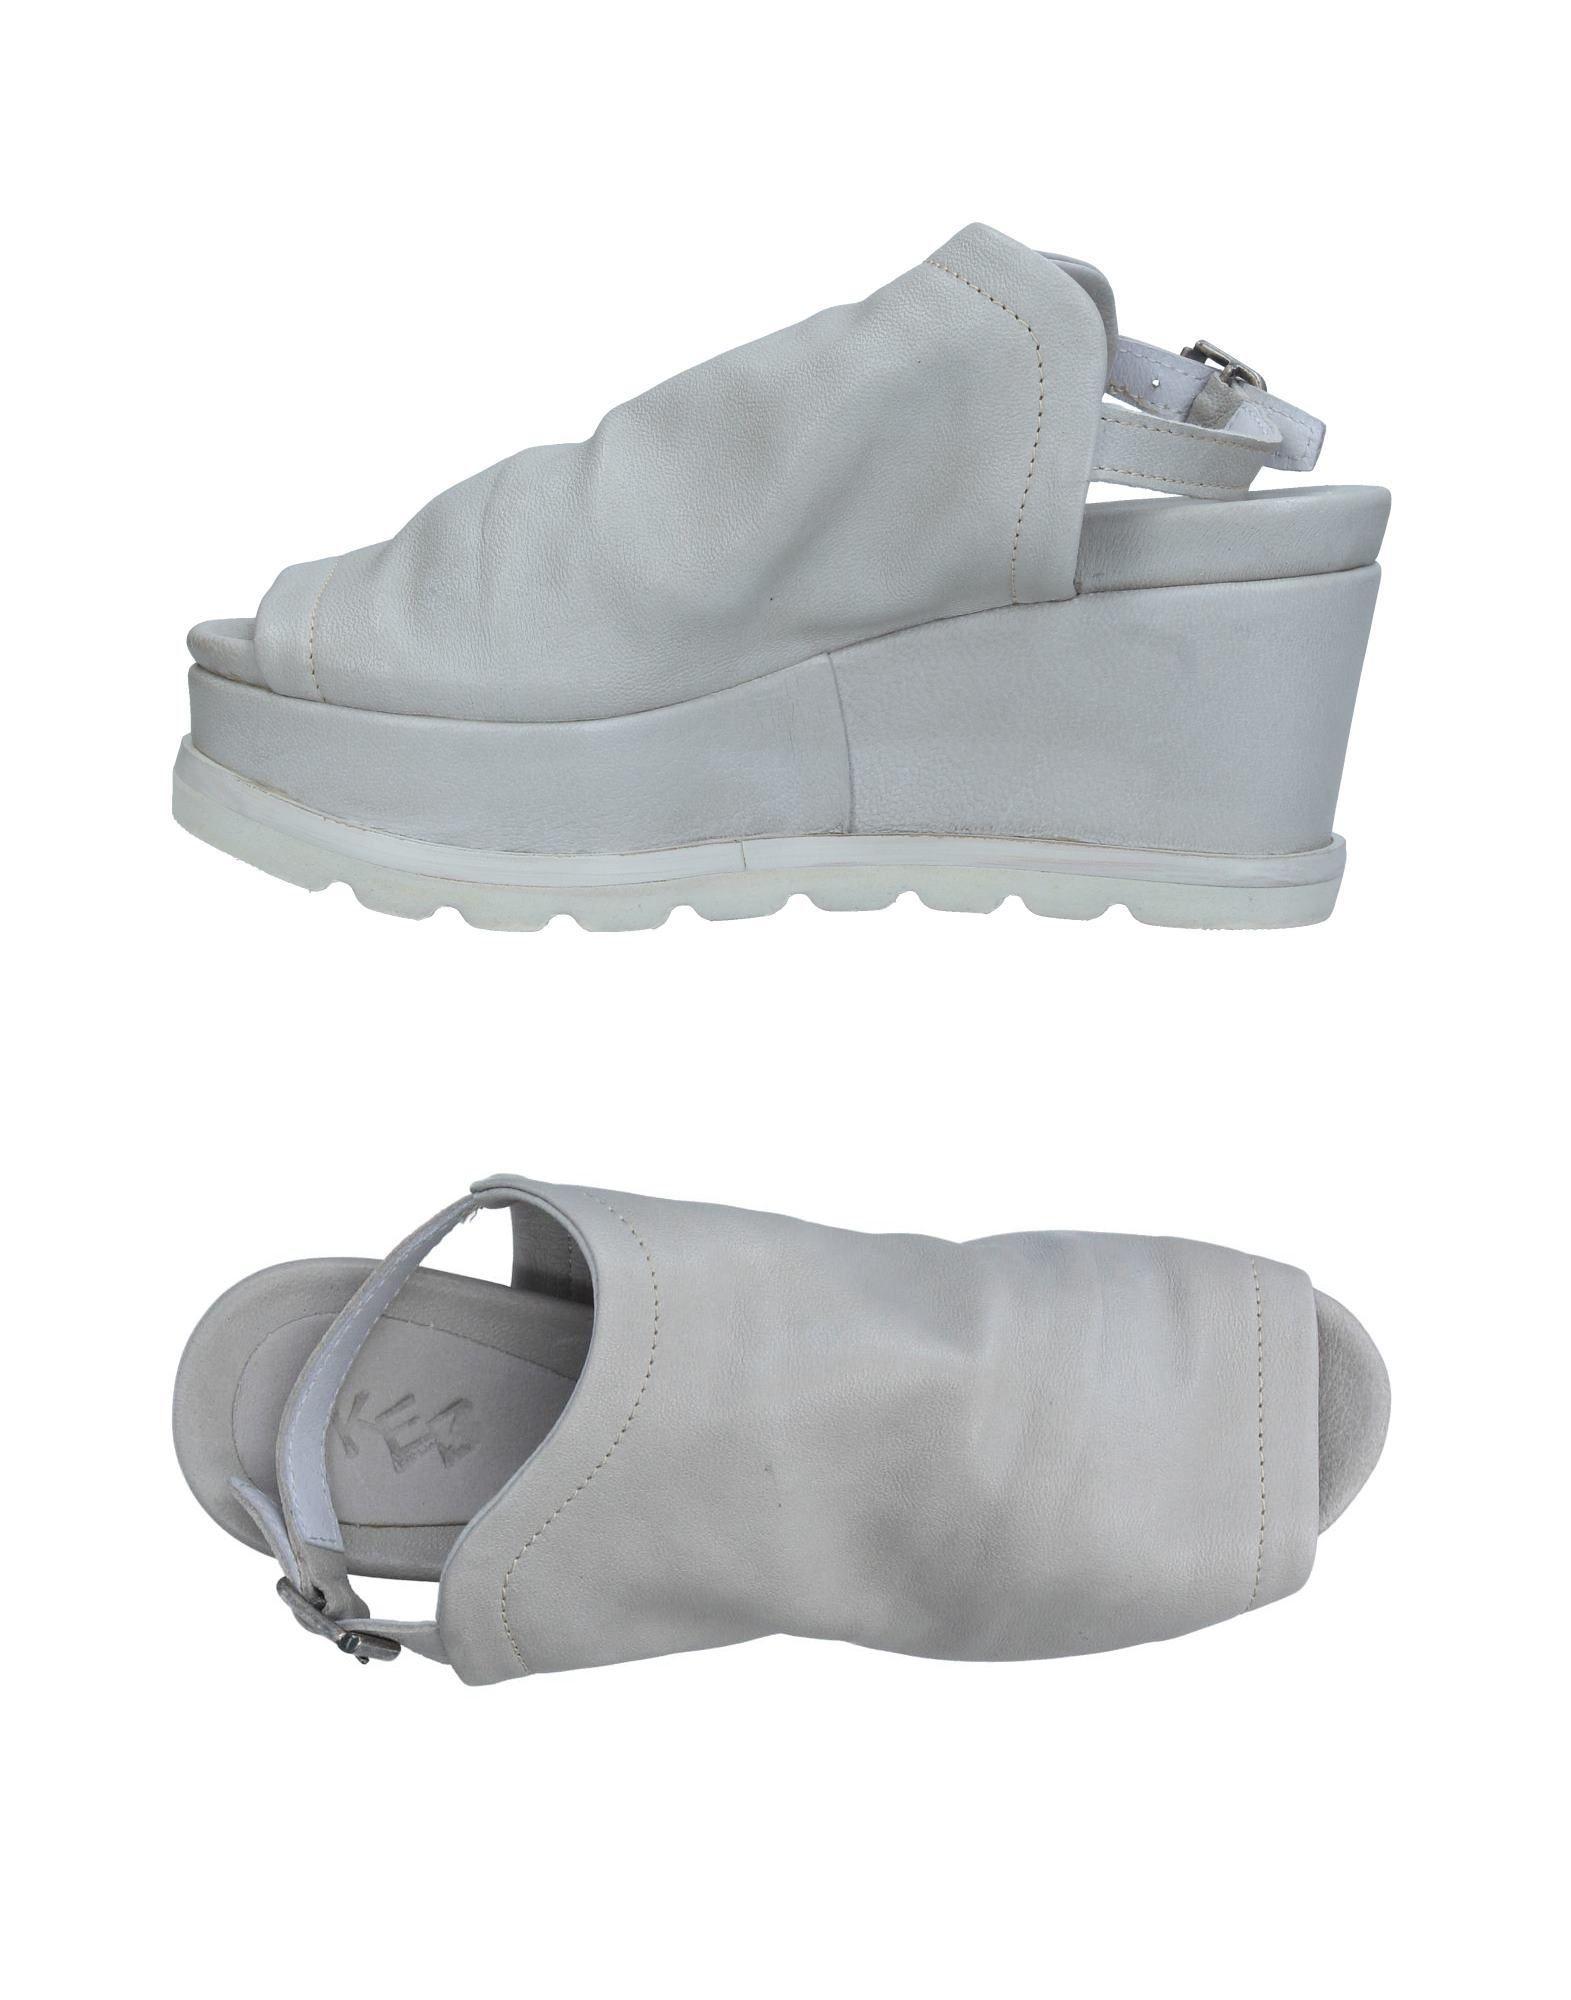 Keb Sandalen Damen  11364649MB Gute Qualität beliebte Schuhe